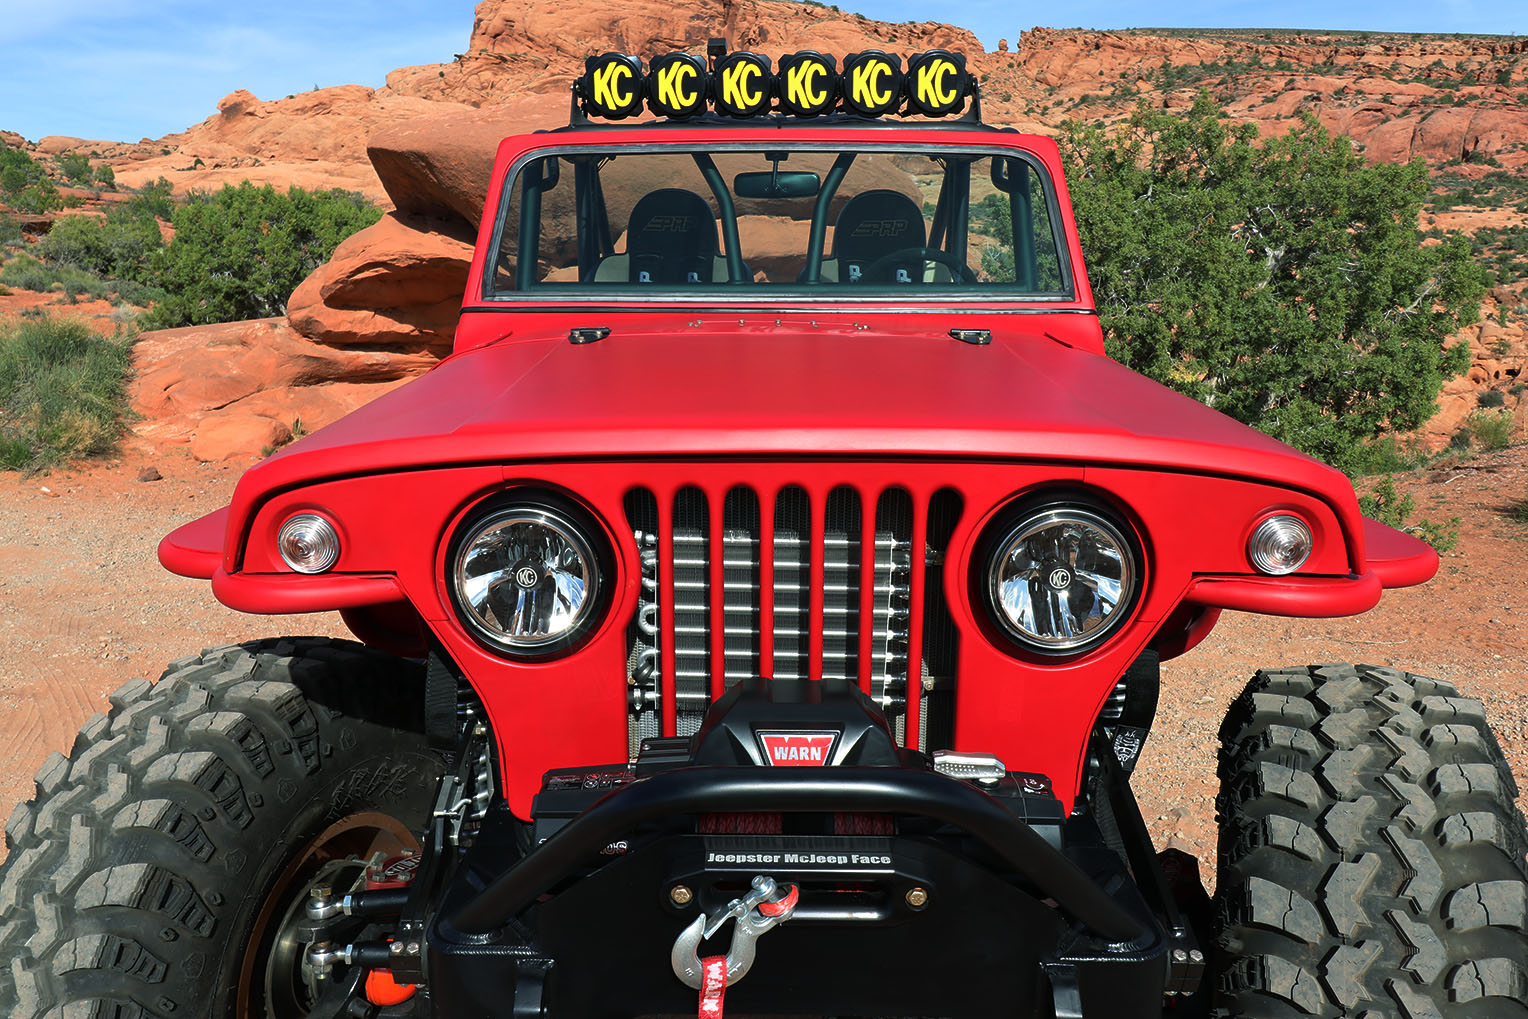 Custom Reconditioned 1973 Jeep Commando Build - Image #01